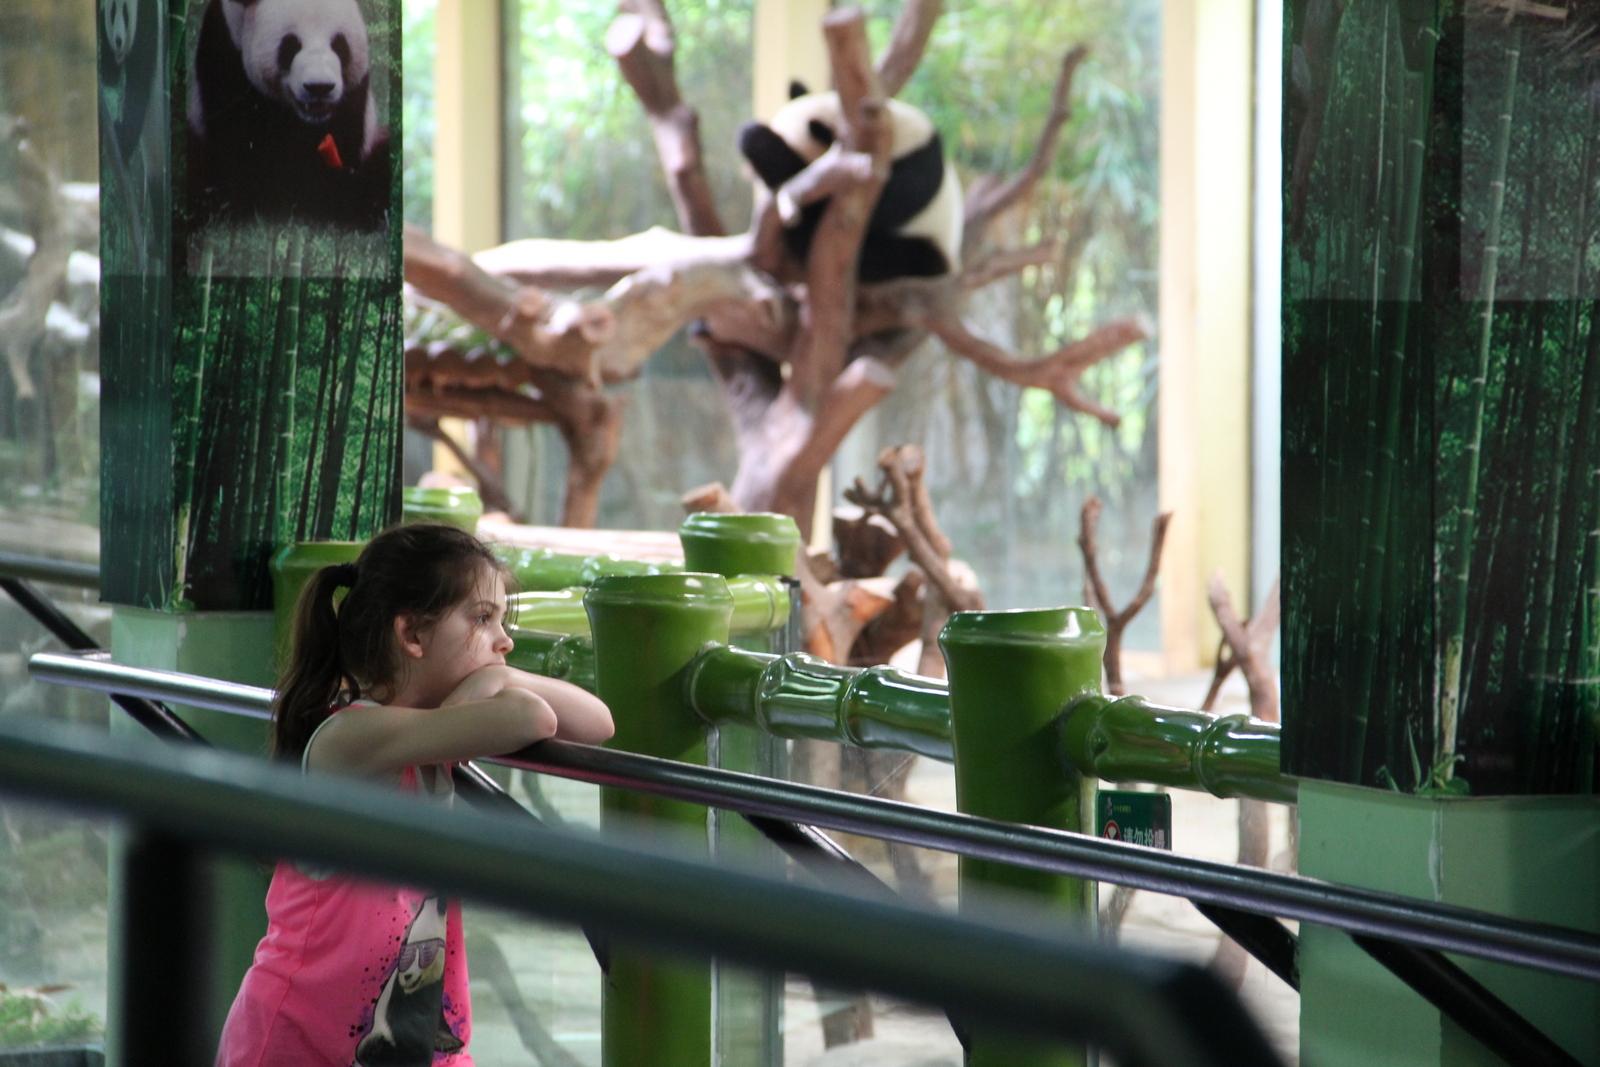 Just admiring the pandas.